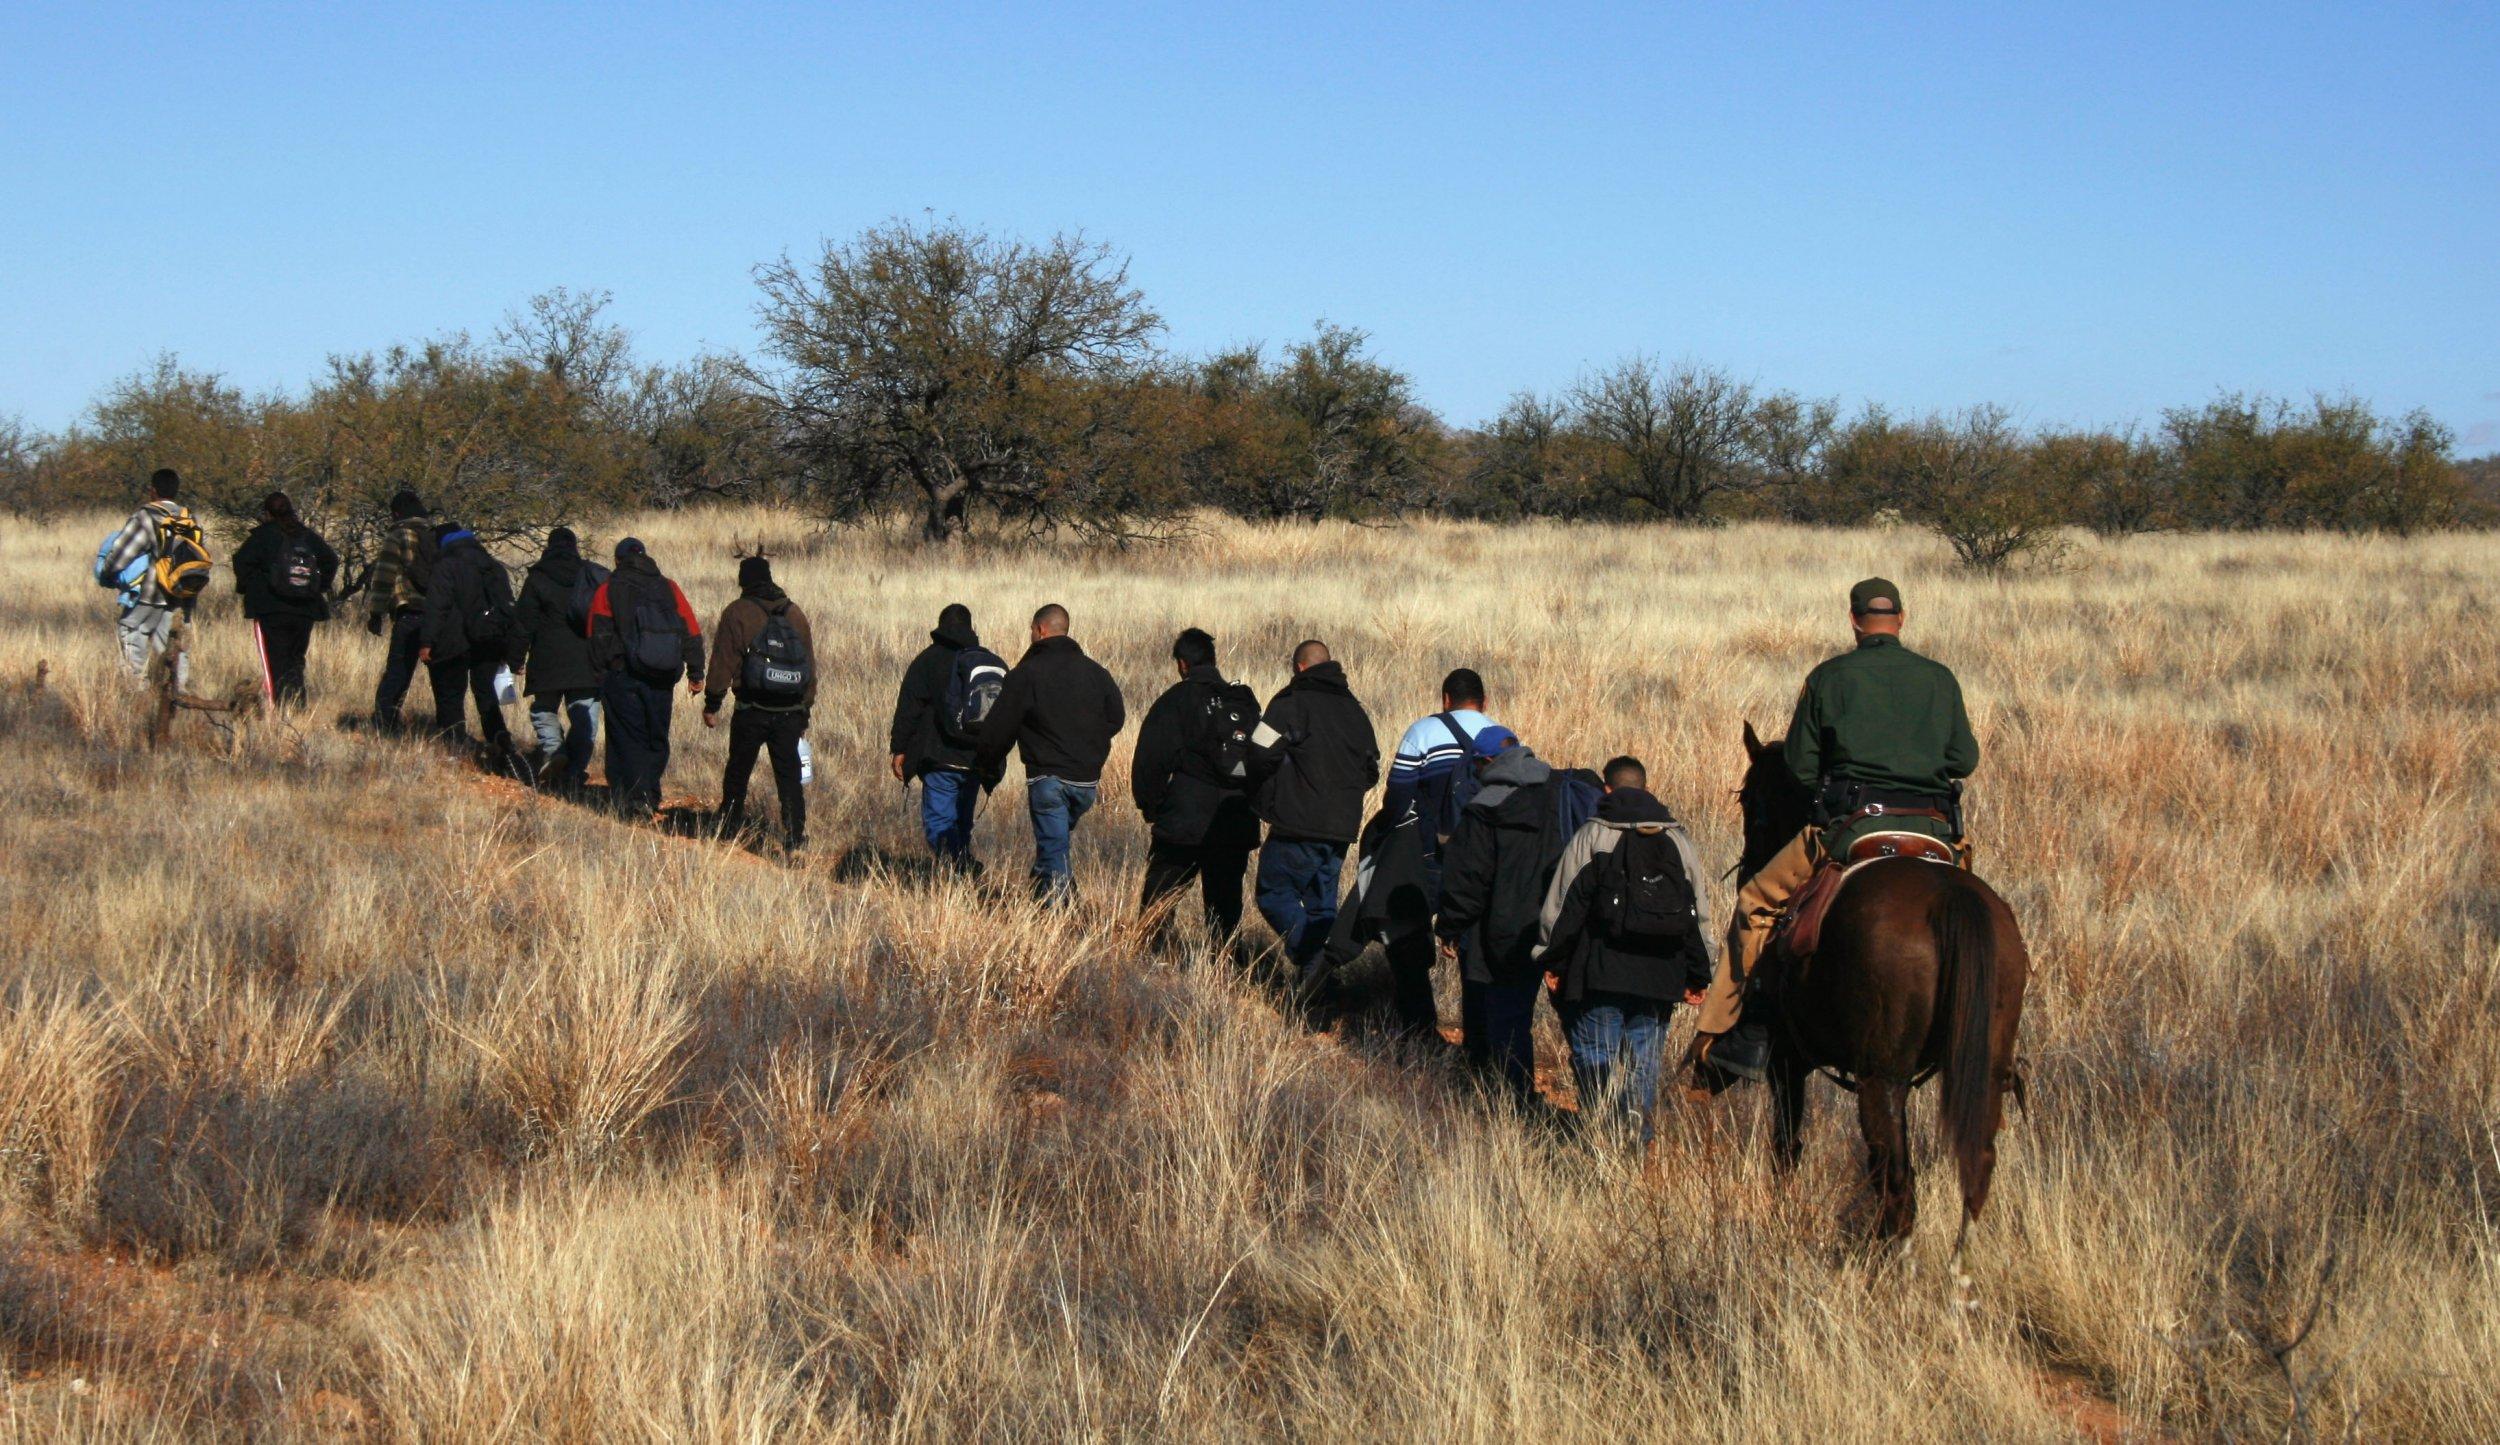 05_18_Arizona_Border_01